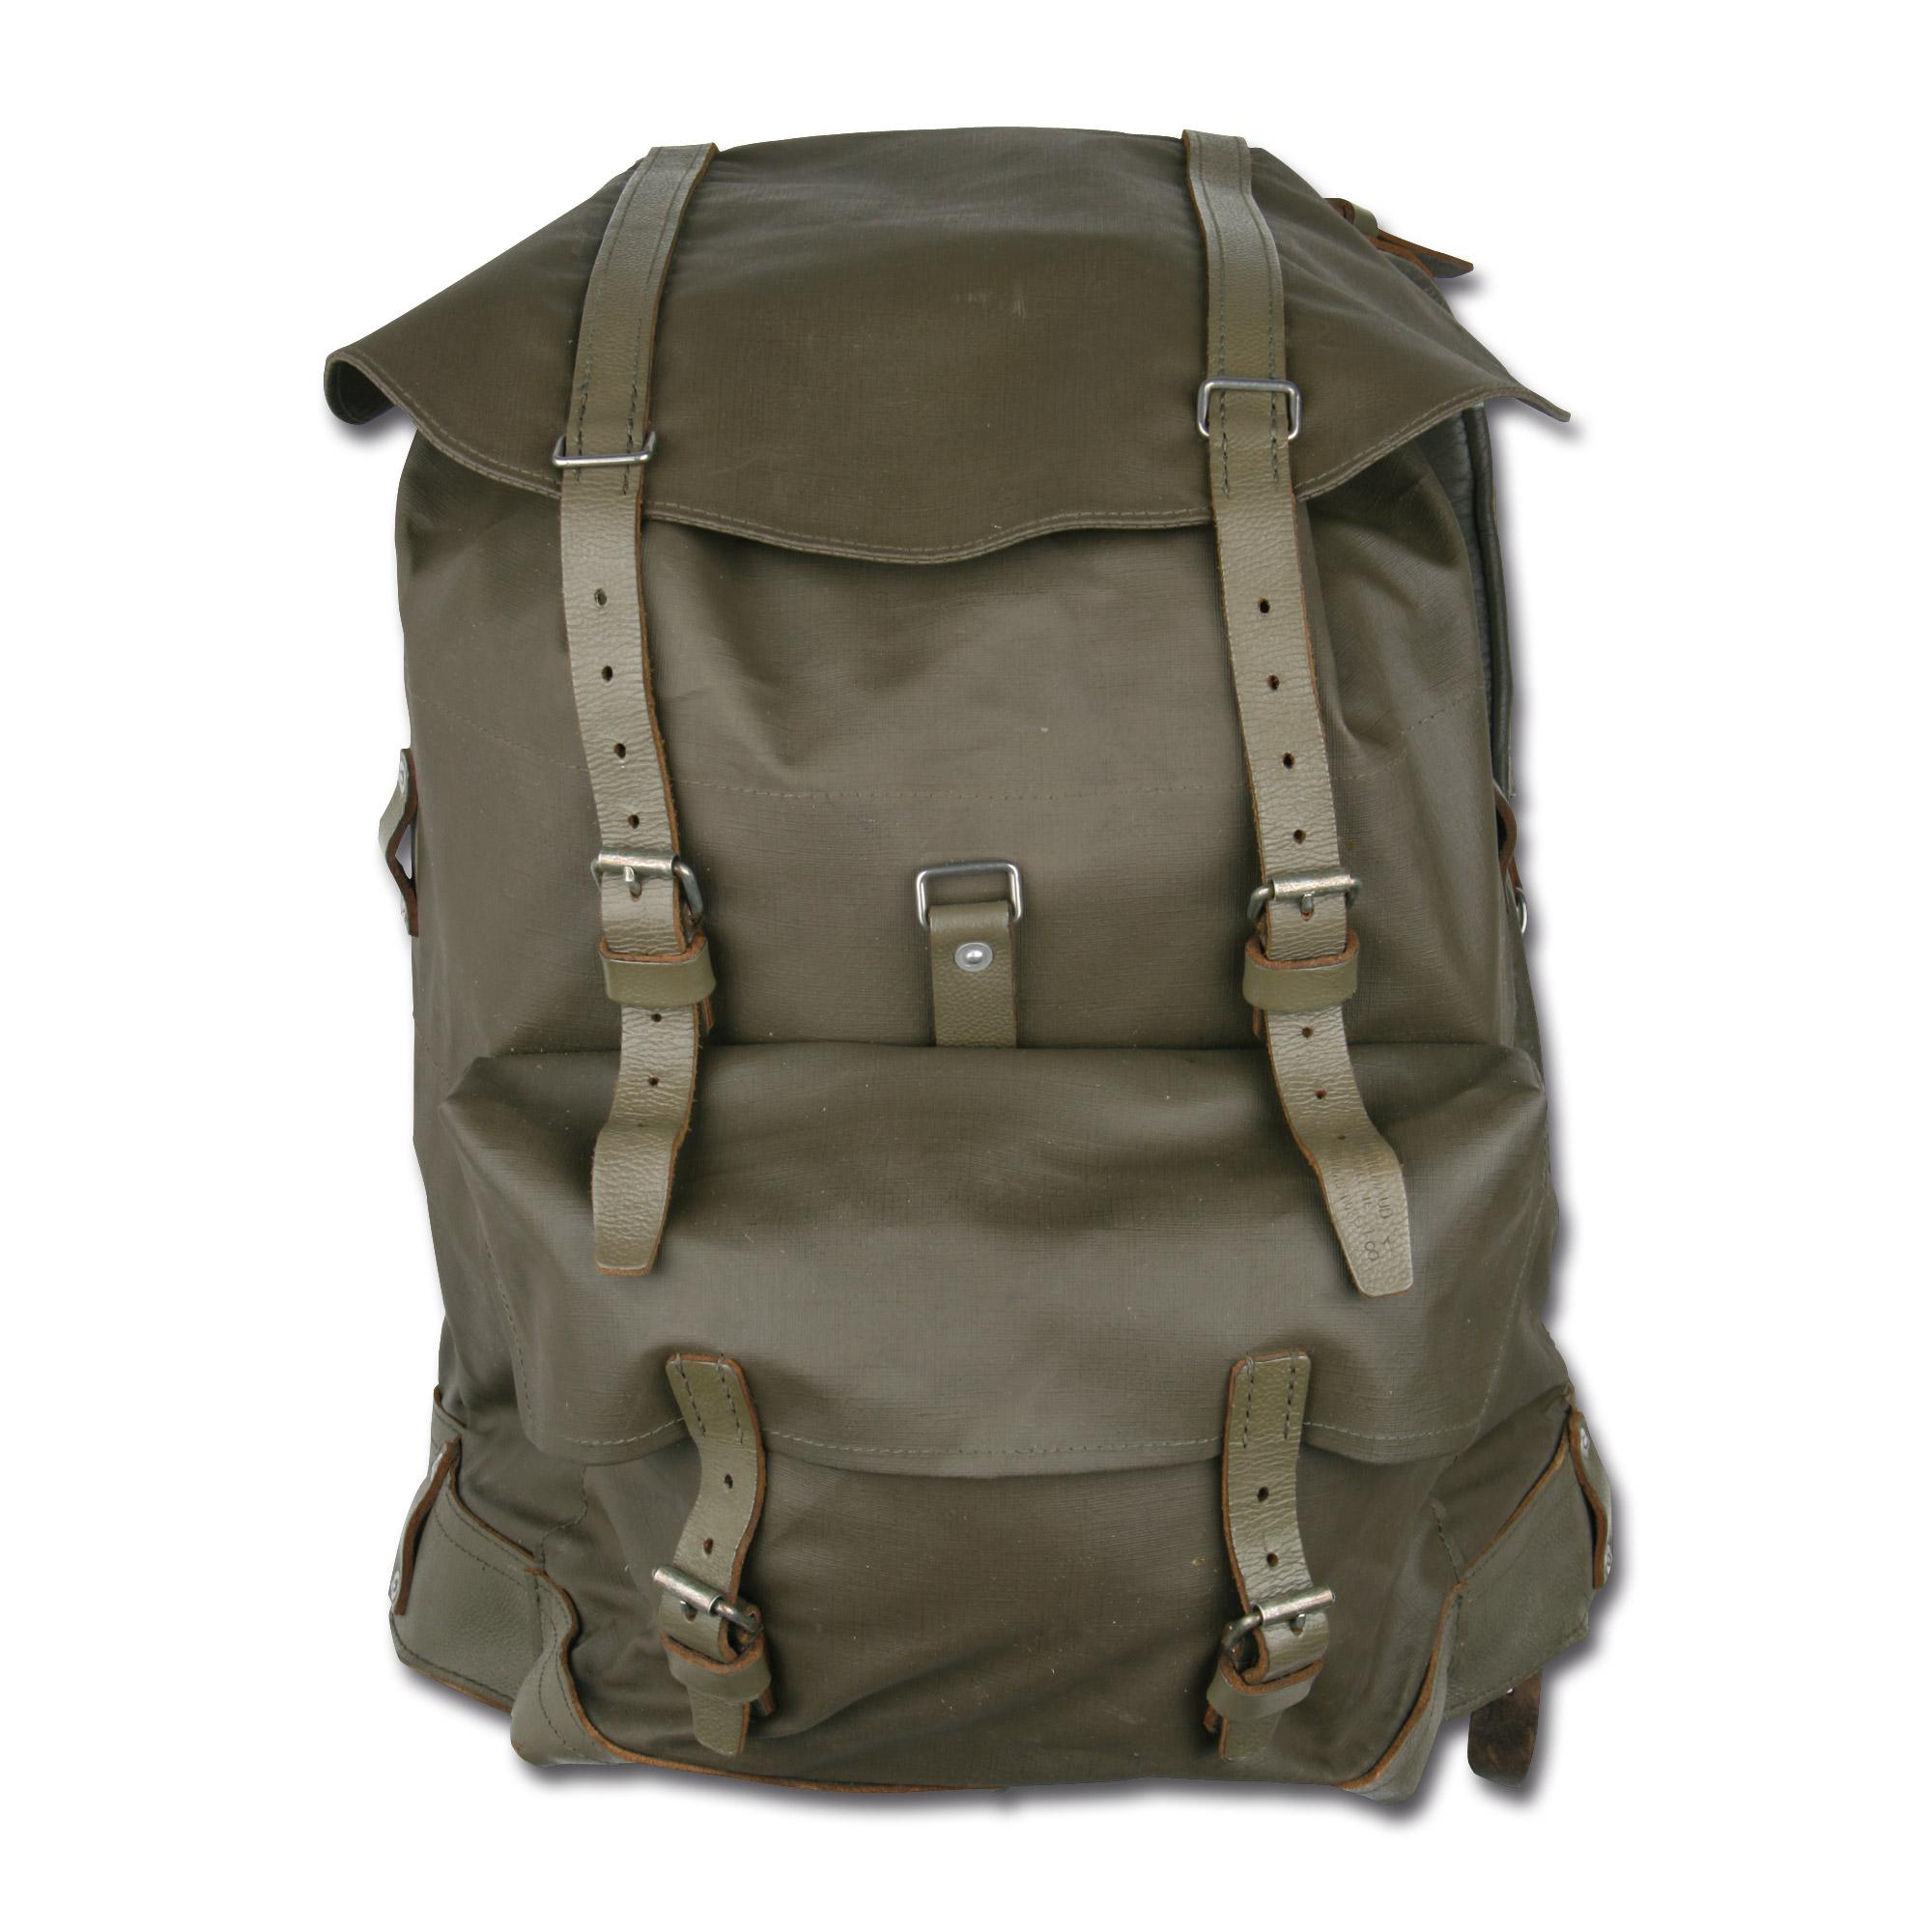 Swiss Army Engineer Backpack Used